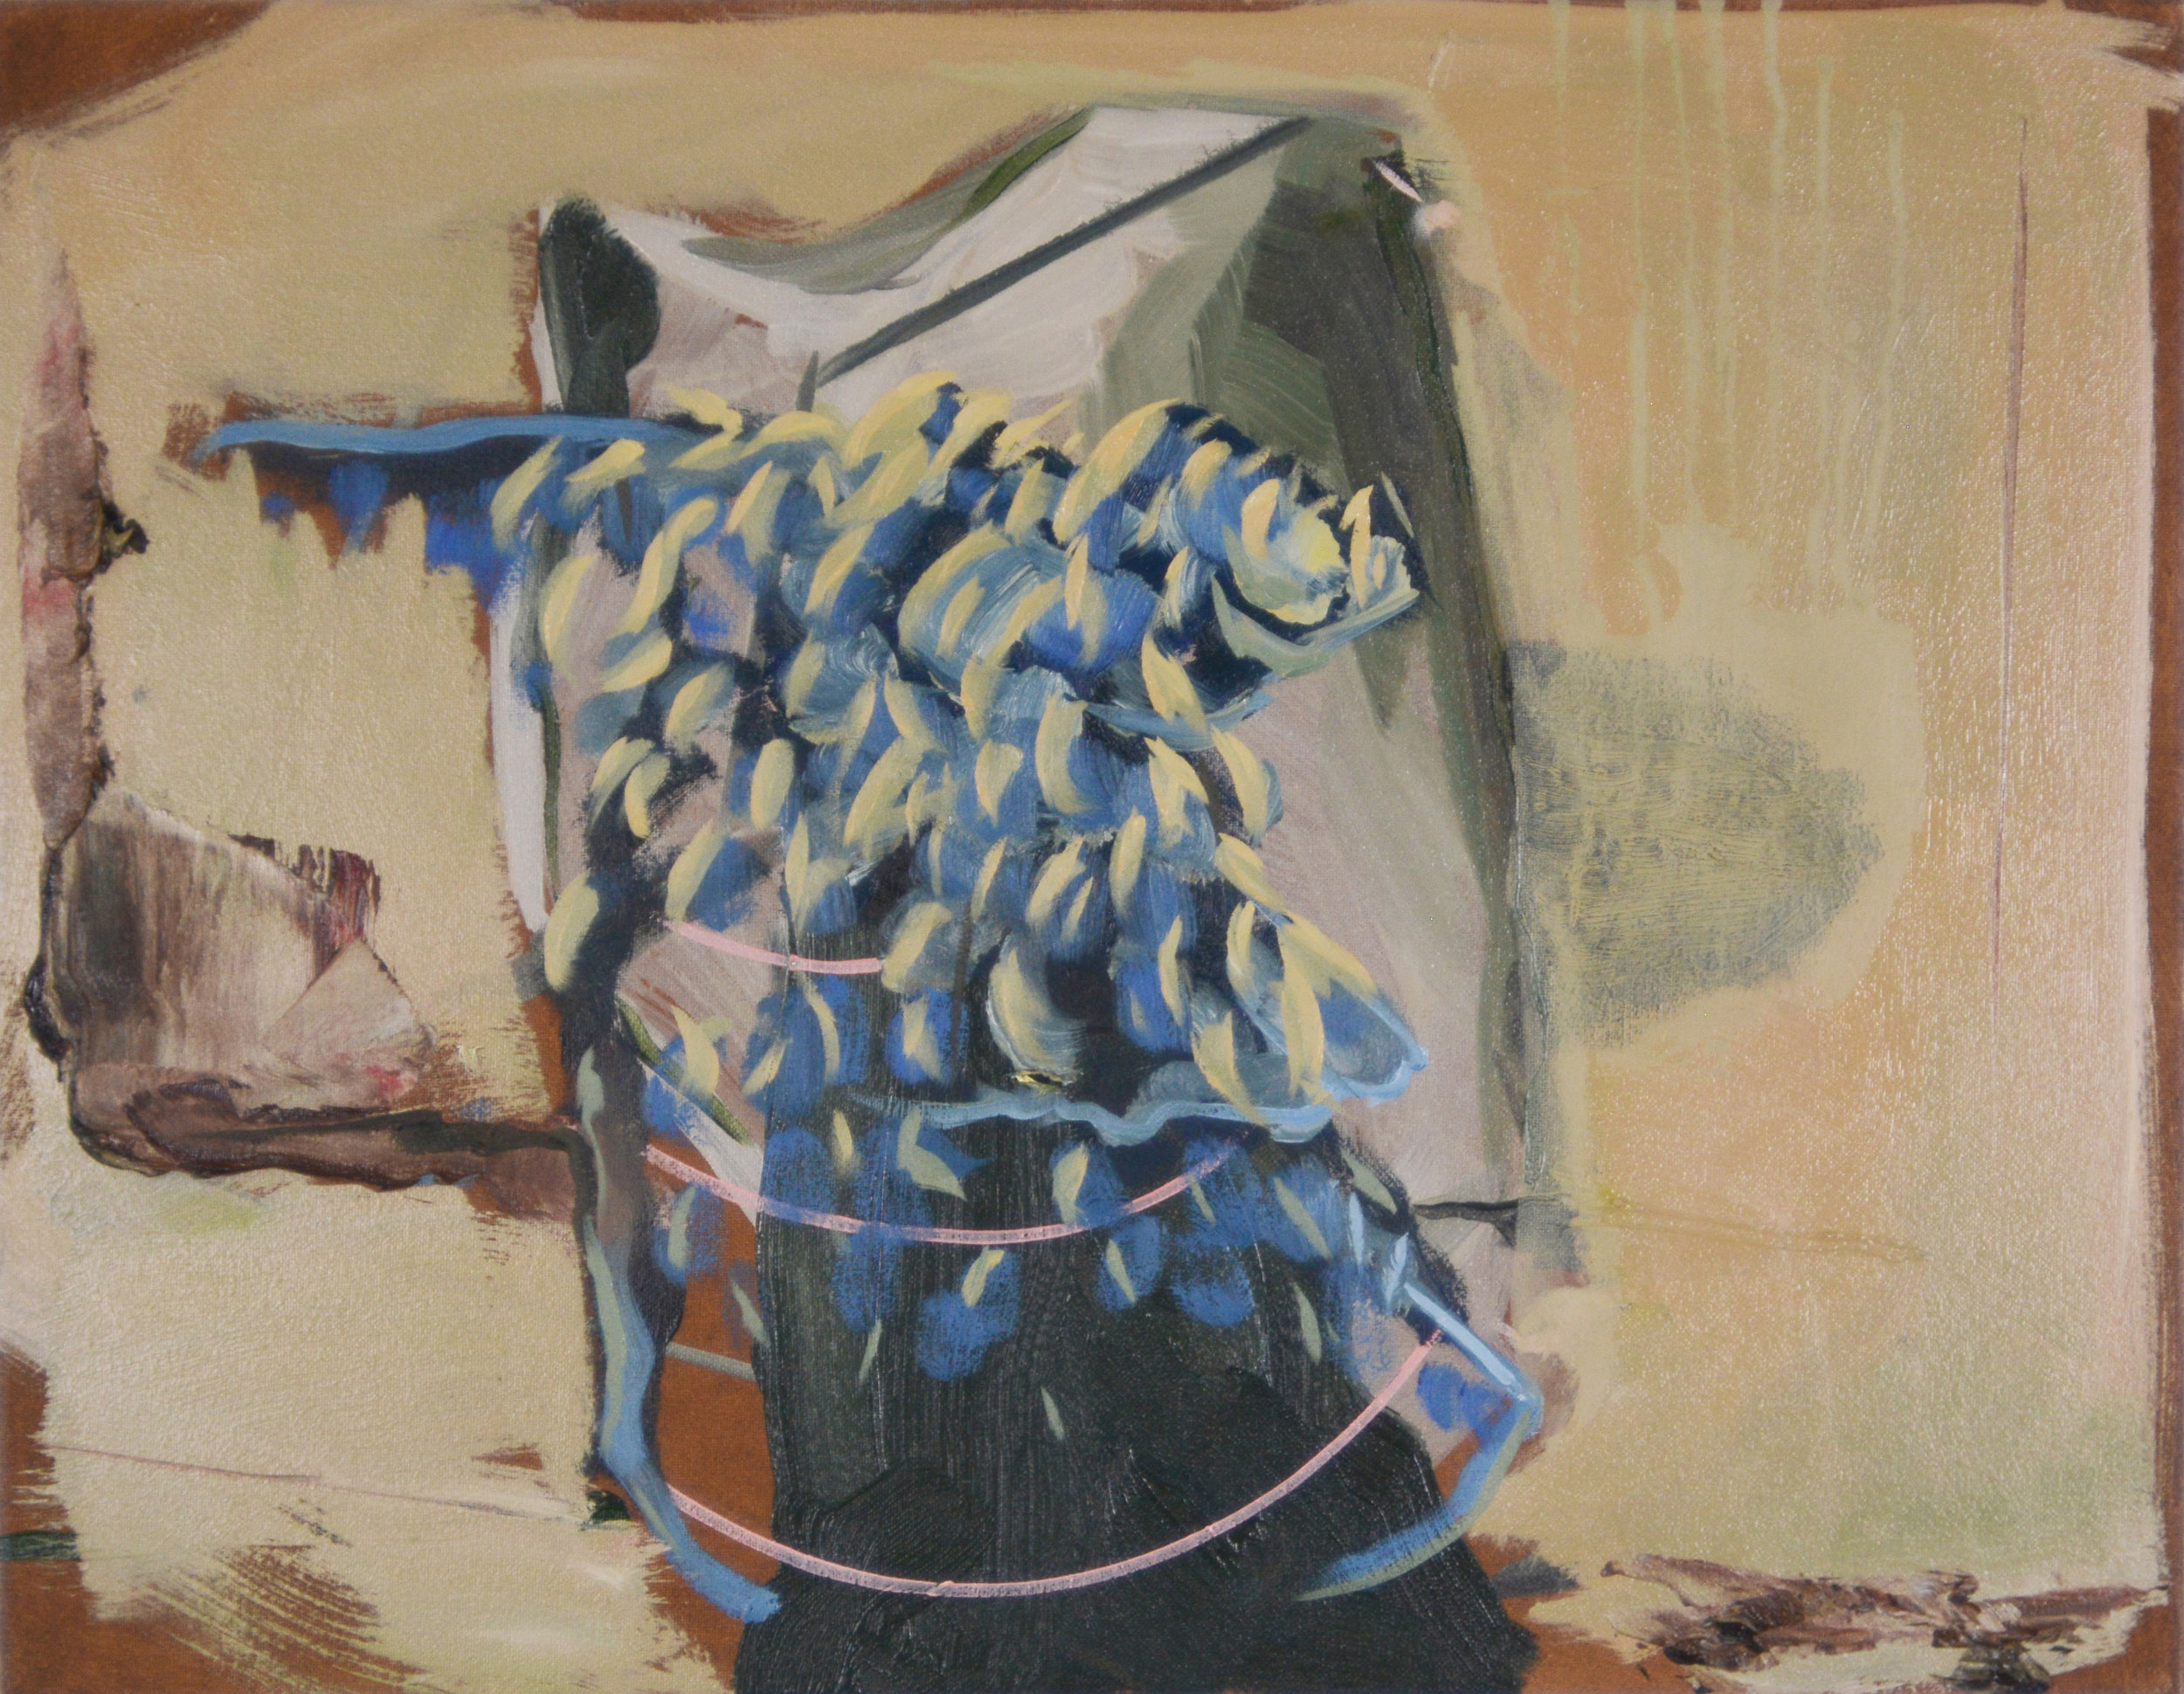 Armature, 2013, Oil on canva, 30 x 40 cm